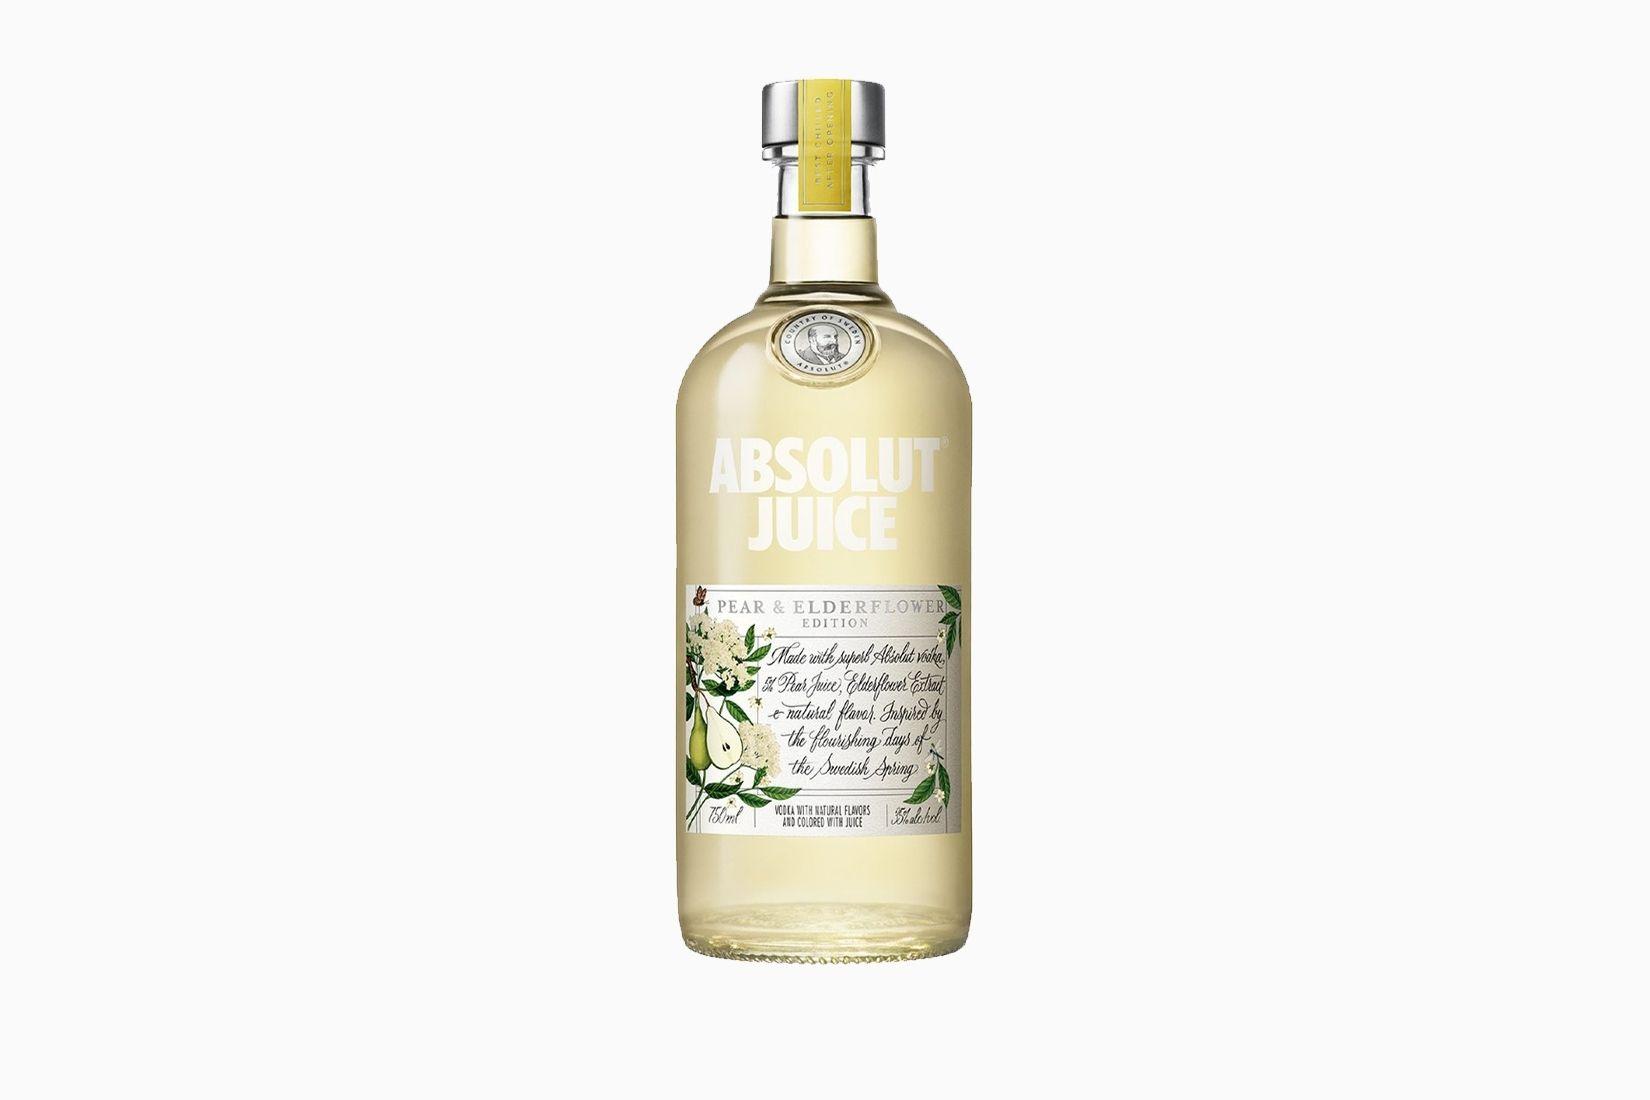 Absolut Vodka Juice Elderflower Edition Price Review - Luxe Digital